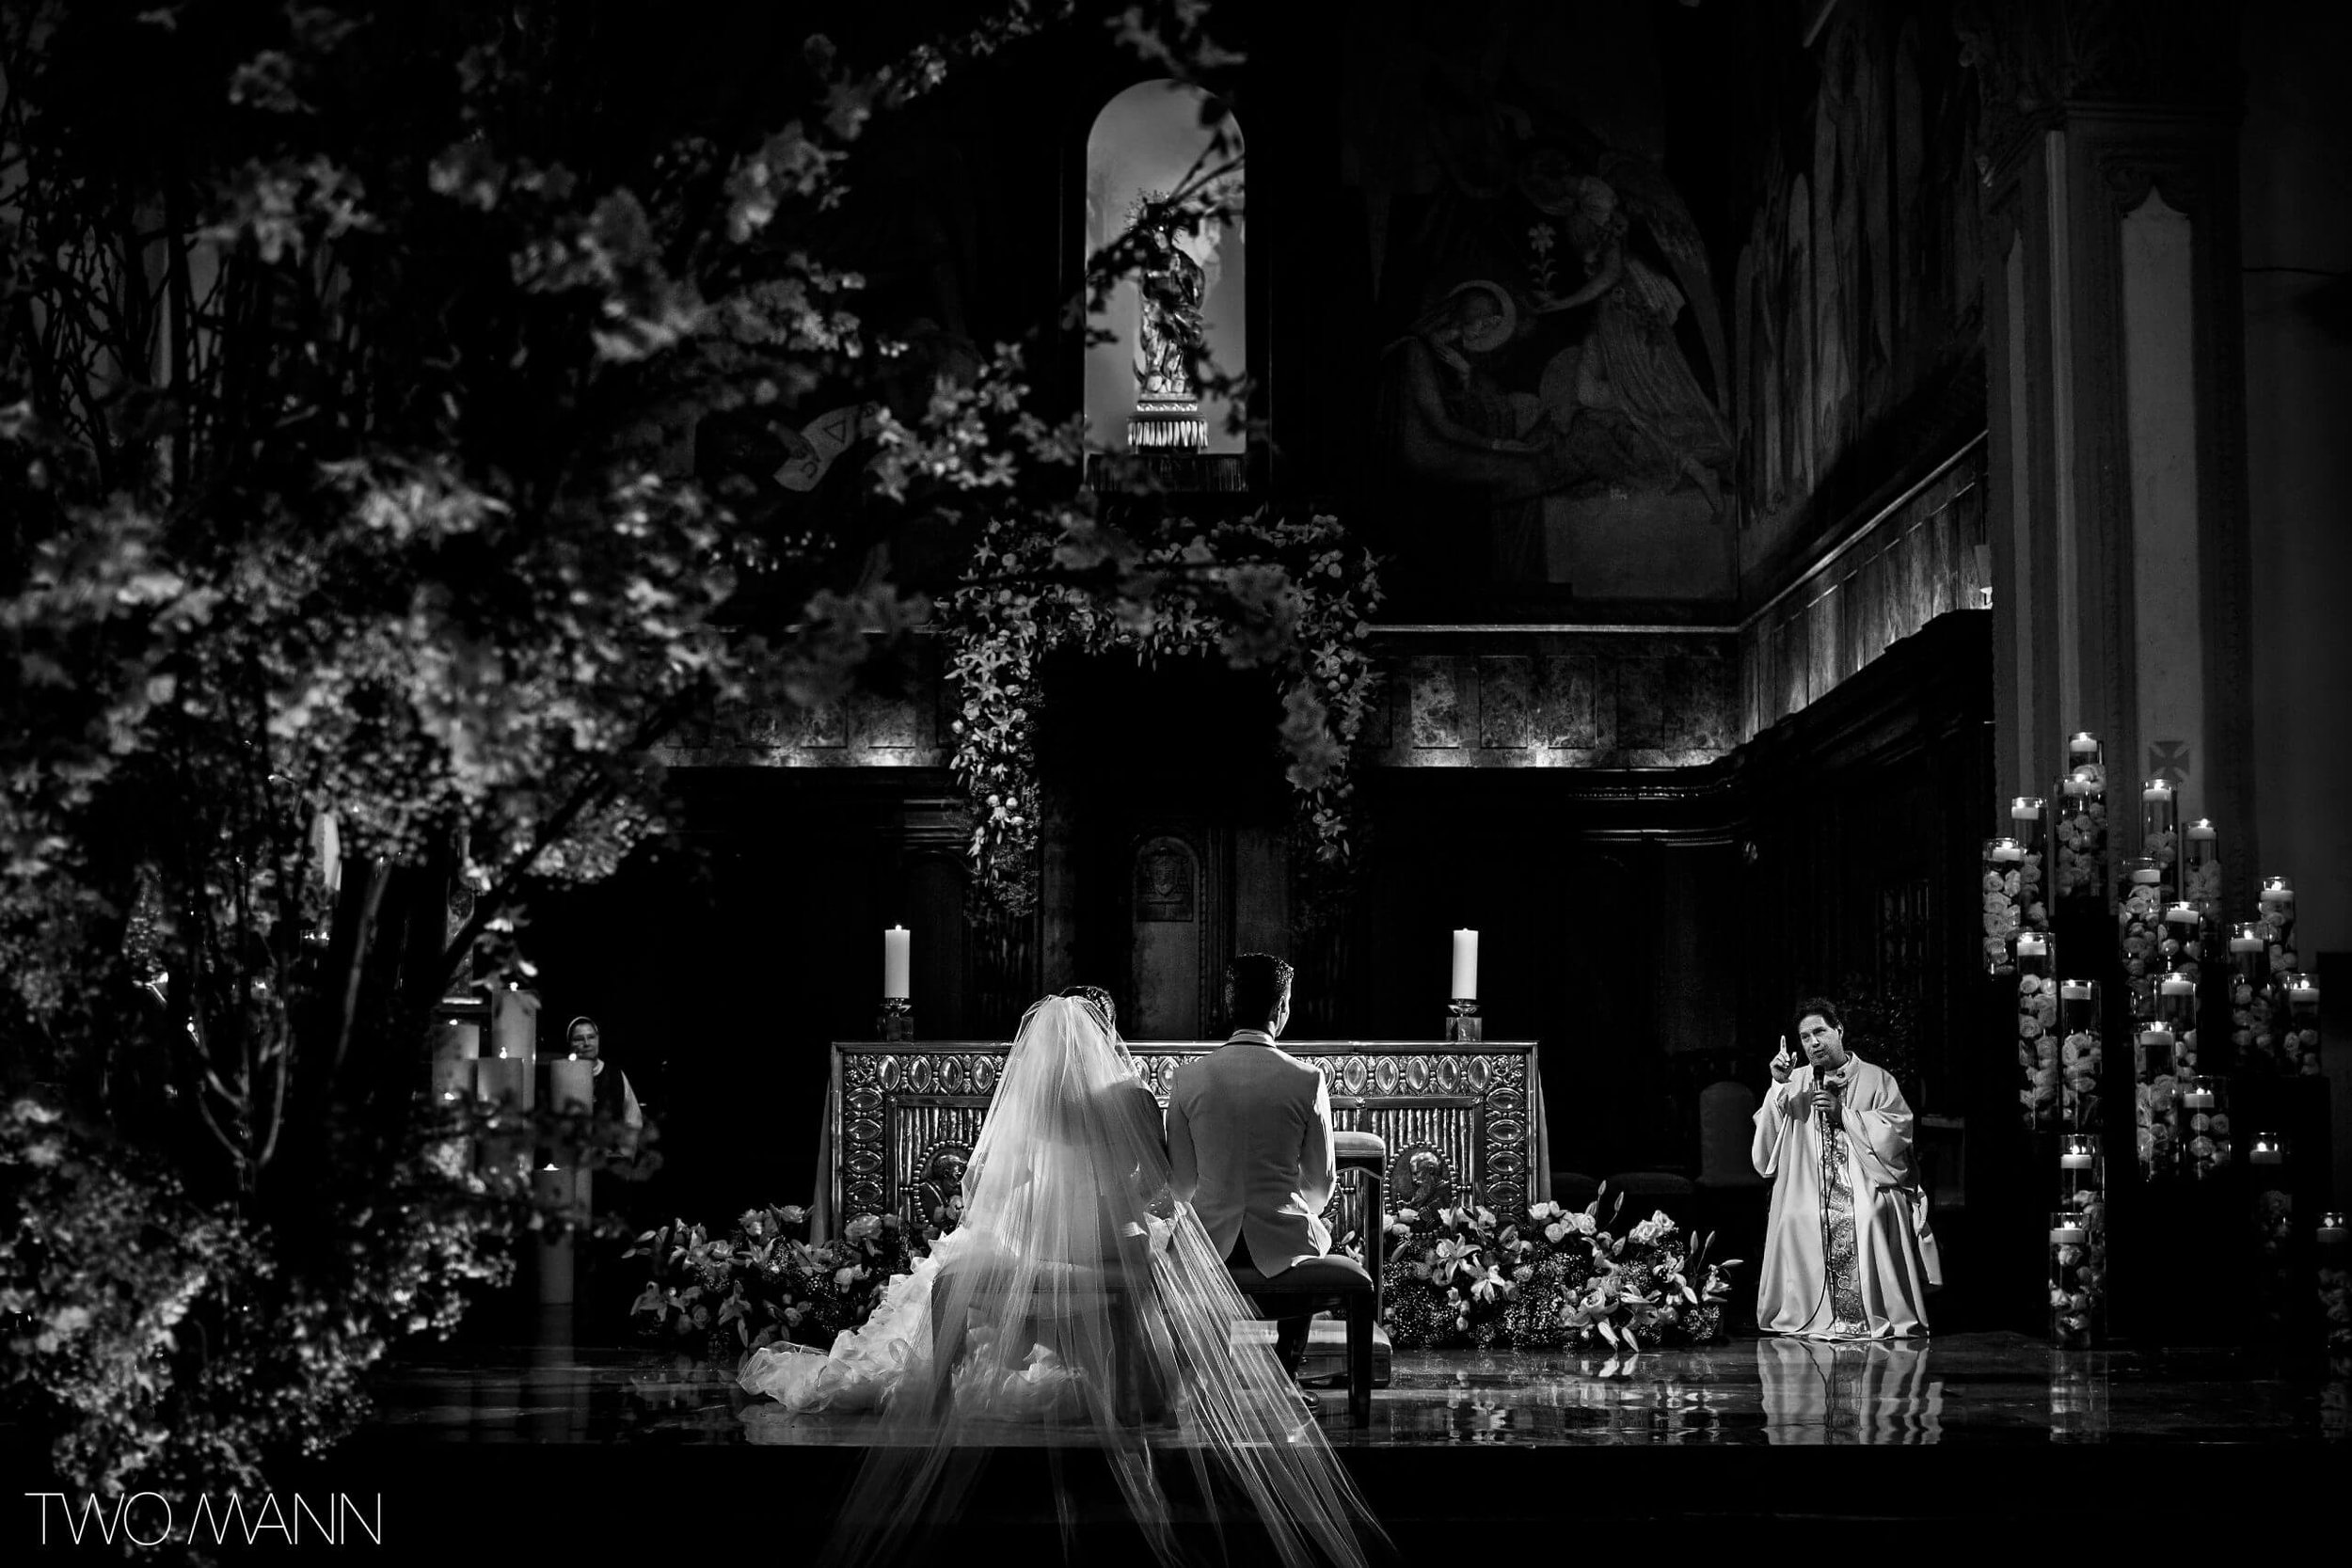 Mexico-Wedding-Photography-Two-Mann-Monica-Mike-Monterrey-20-2560x1707.jpg